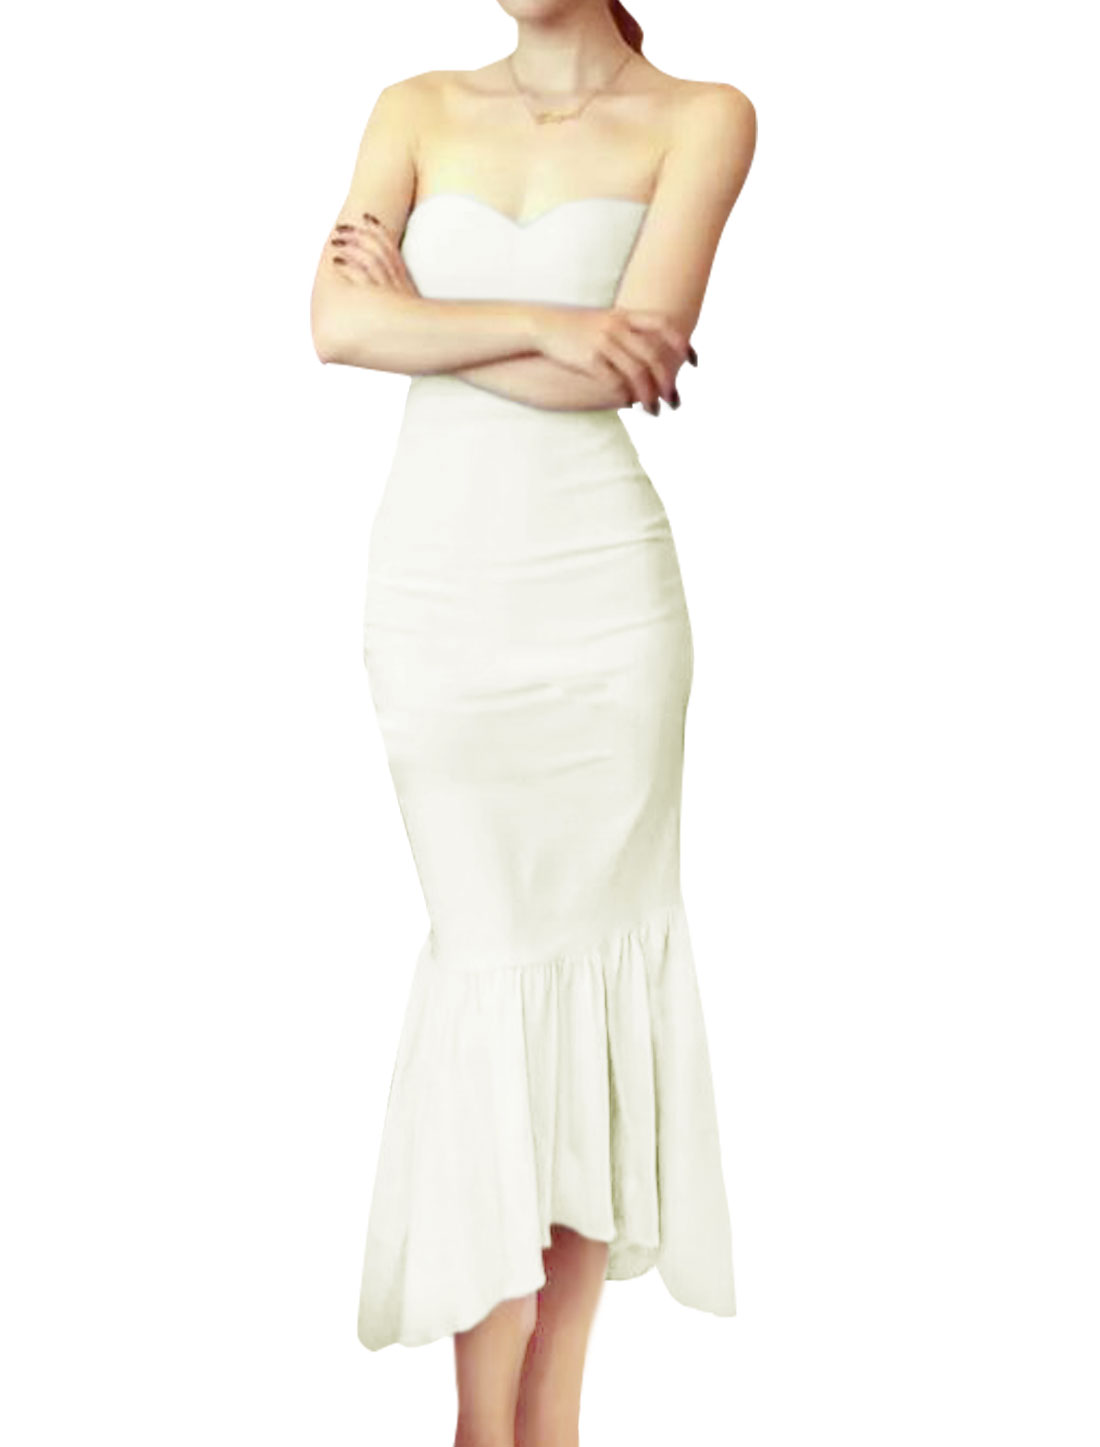 Women Sweetheart Neckline High Low Hem Fishtail Dress White XS